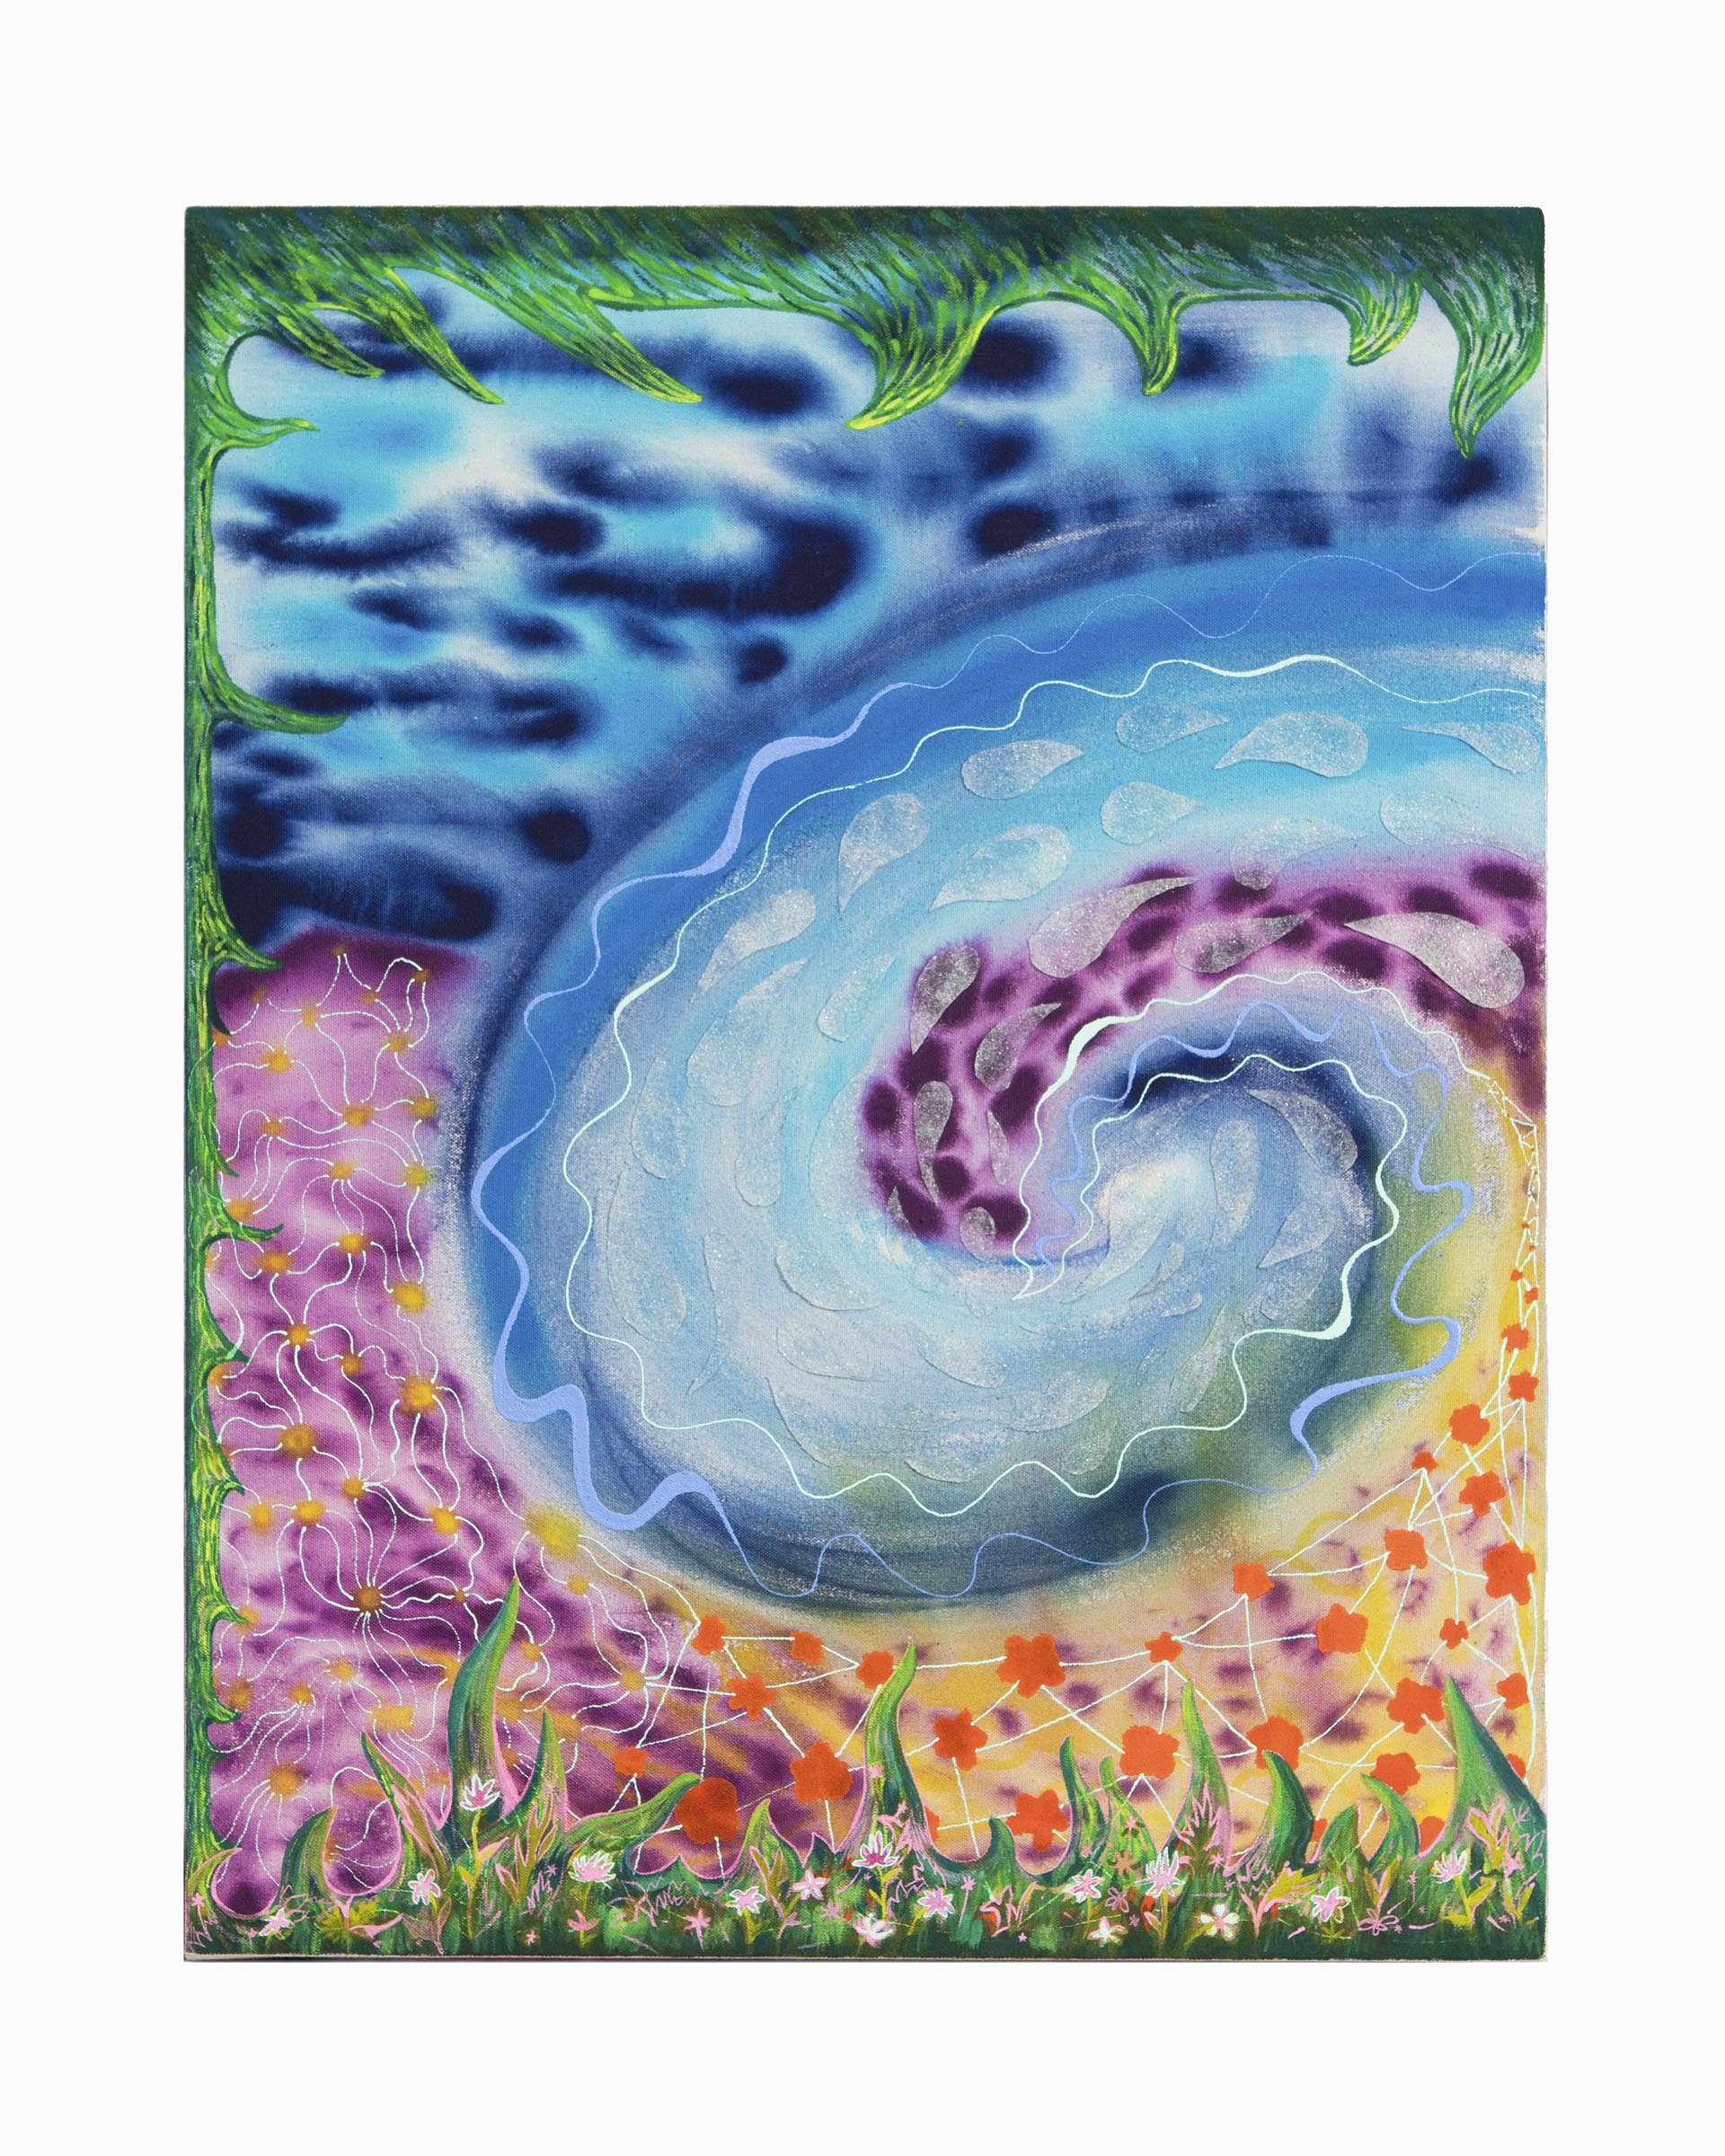 Natessa Amin, Falling like Drops of Water, Acrylic and glass bead on canvas, 20